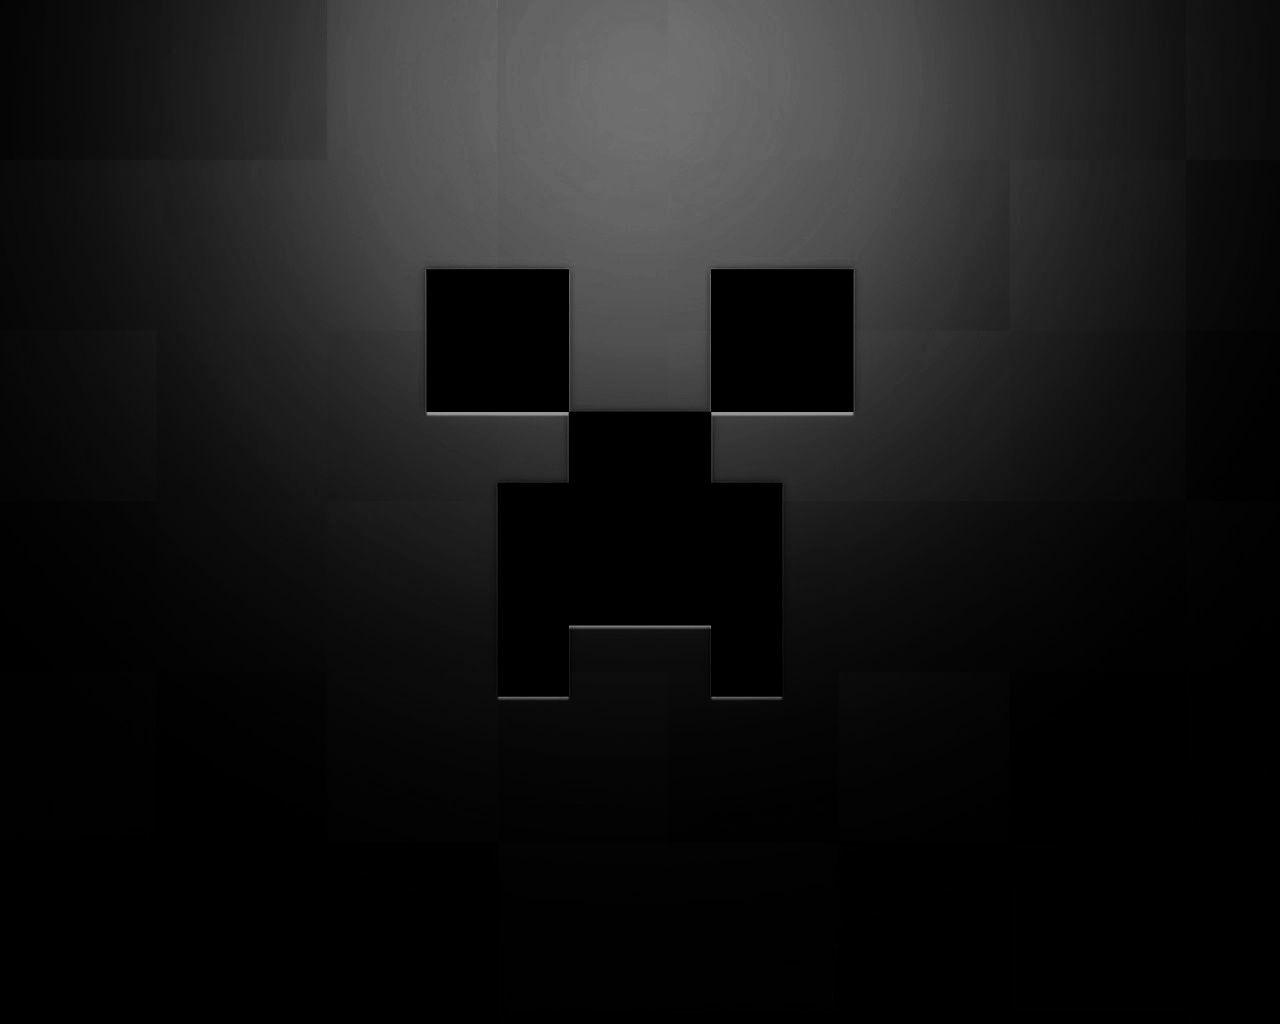 10 Best Minecraft Creeper Wallpapers Minecraftrs Com Minecraft Wallpaper Minecraft Creepers